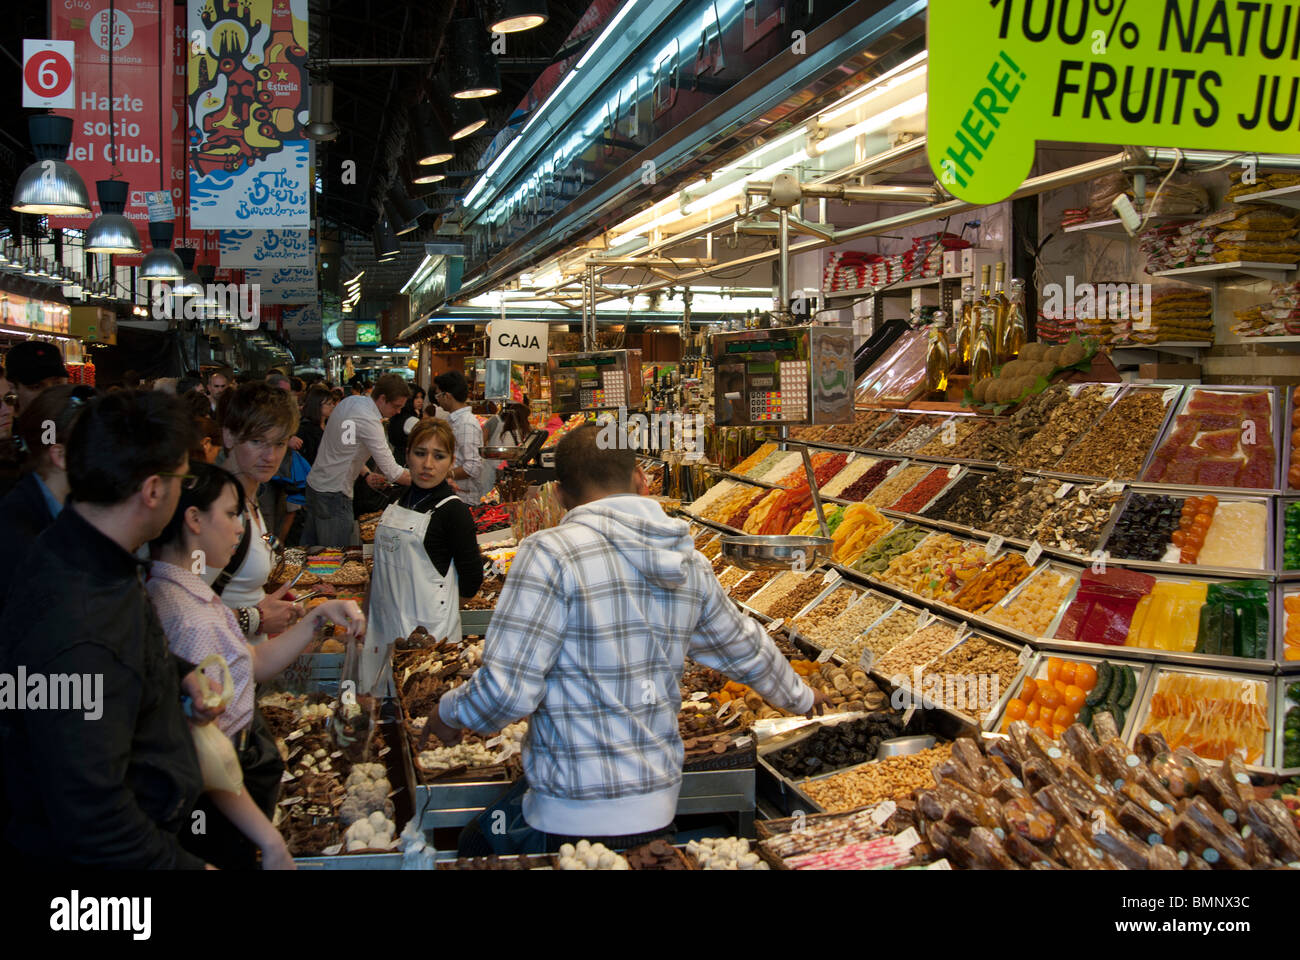 Mercat de la Boqueria, Barcelona, Spain - Stock Image